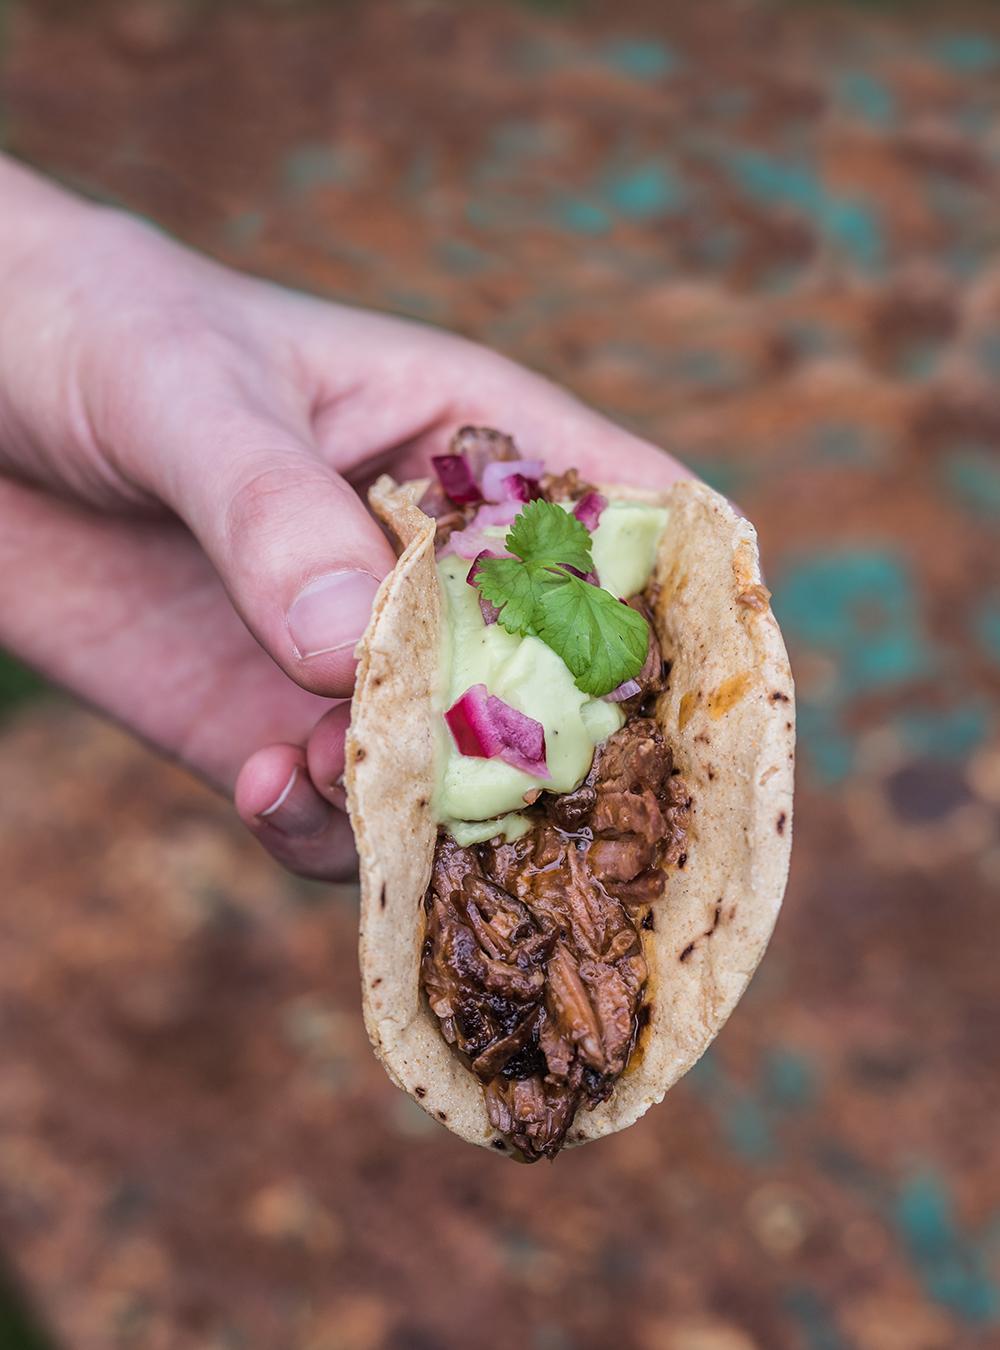 Barbacoa Style Beef Tacos - Langsam geschmortes mexikanisches Rindfleisch